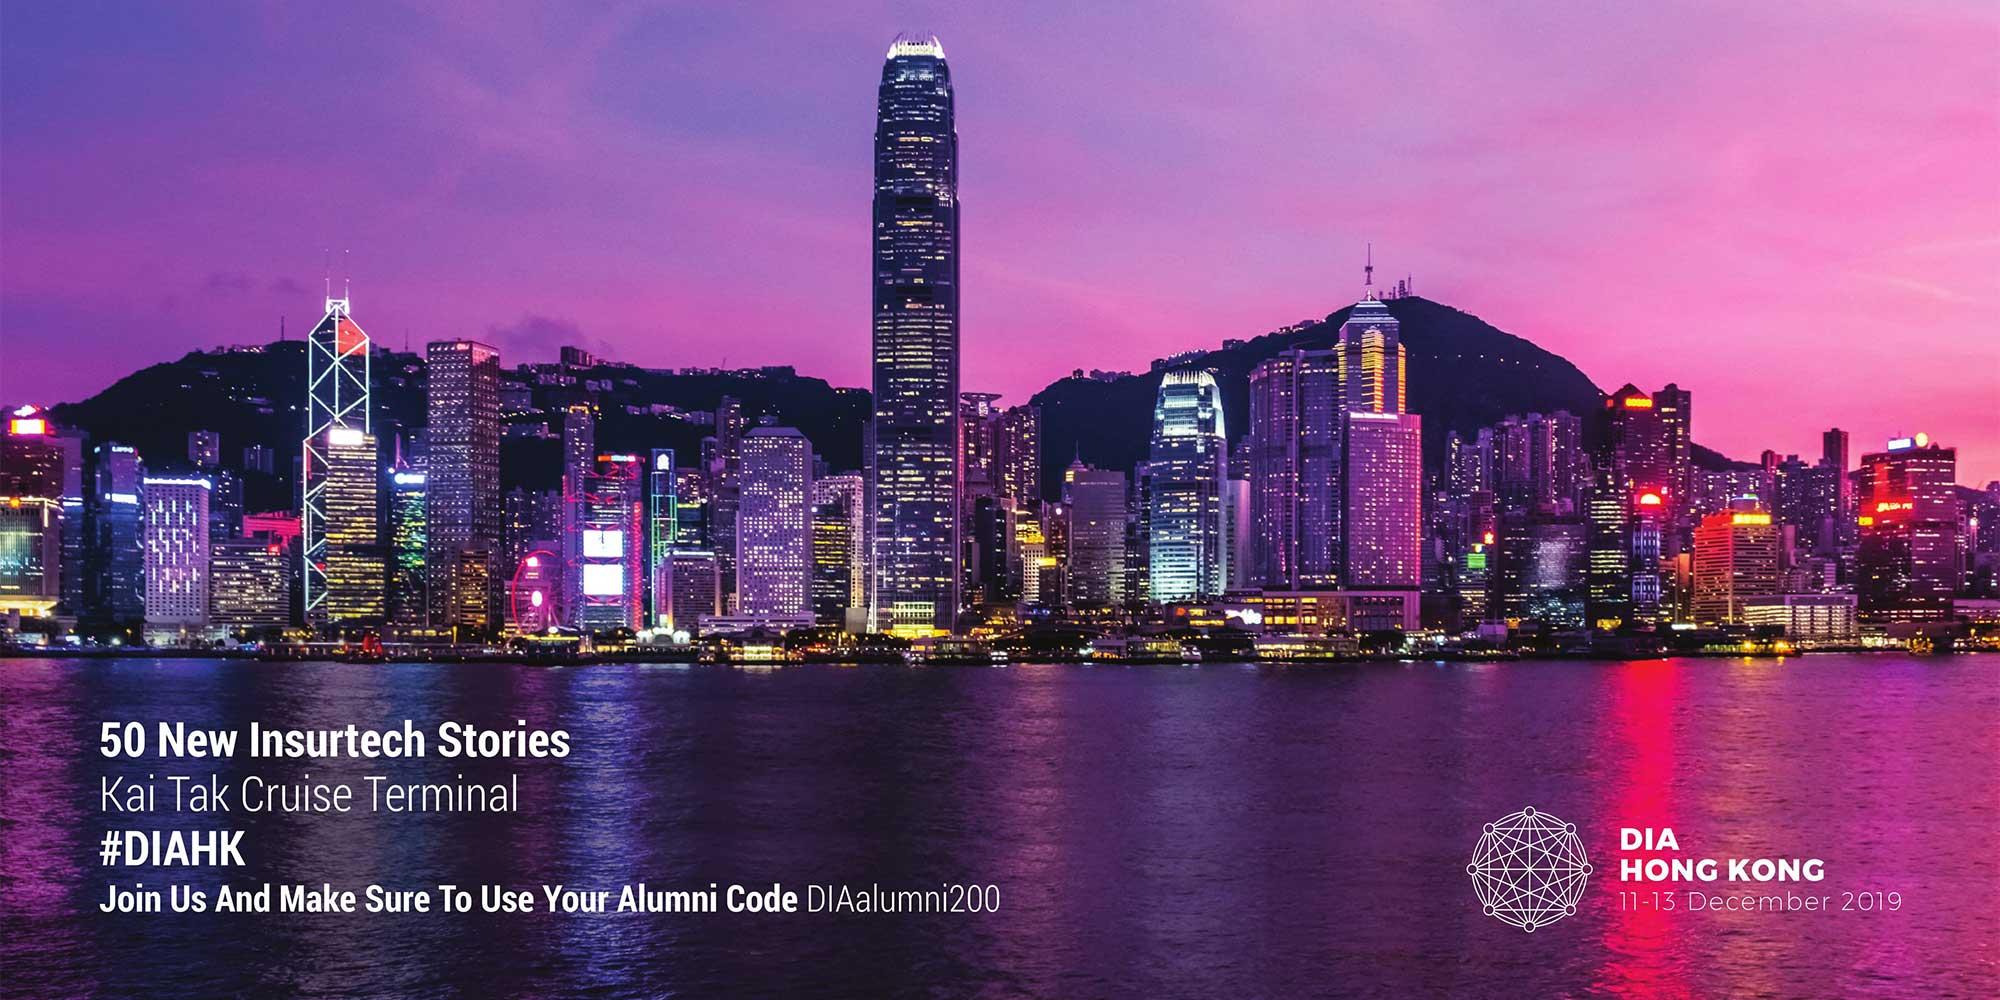 DIA Hong Kong in Dezember 2019